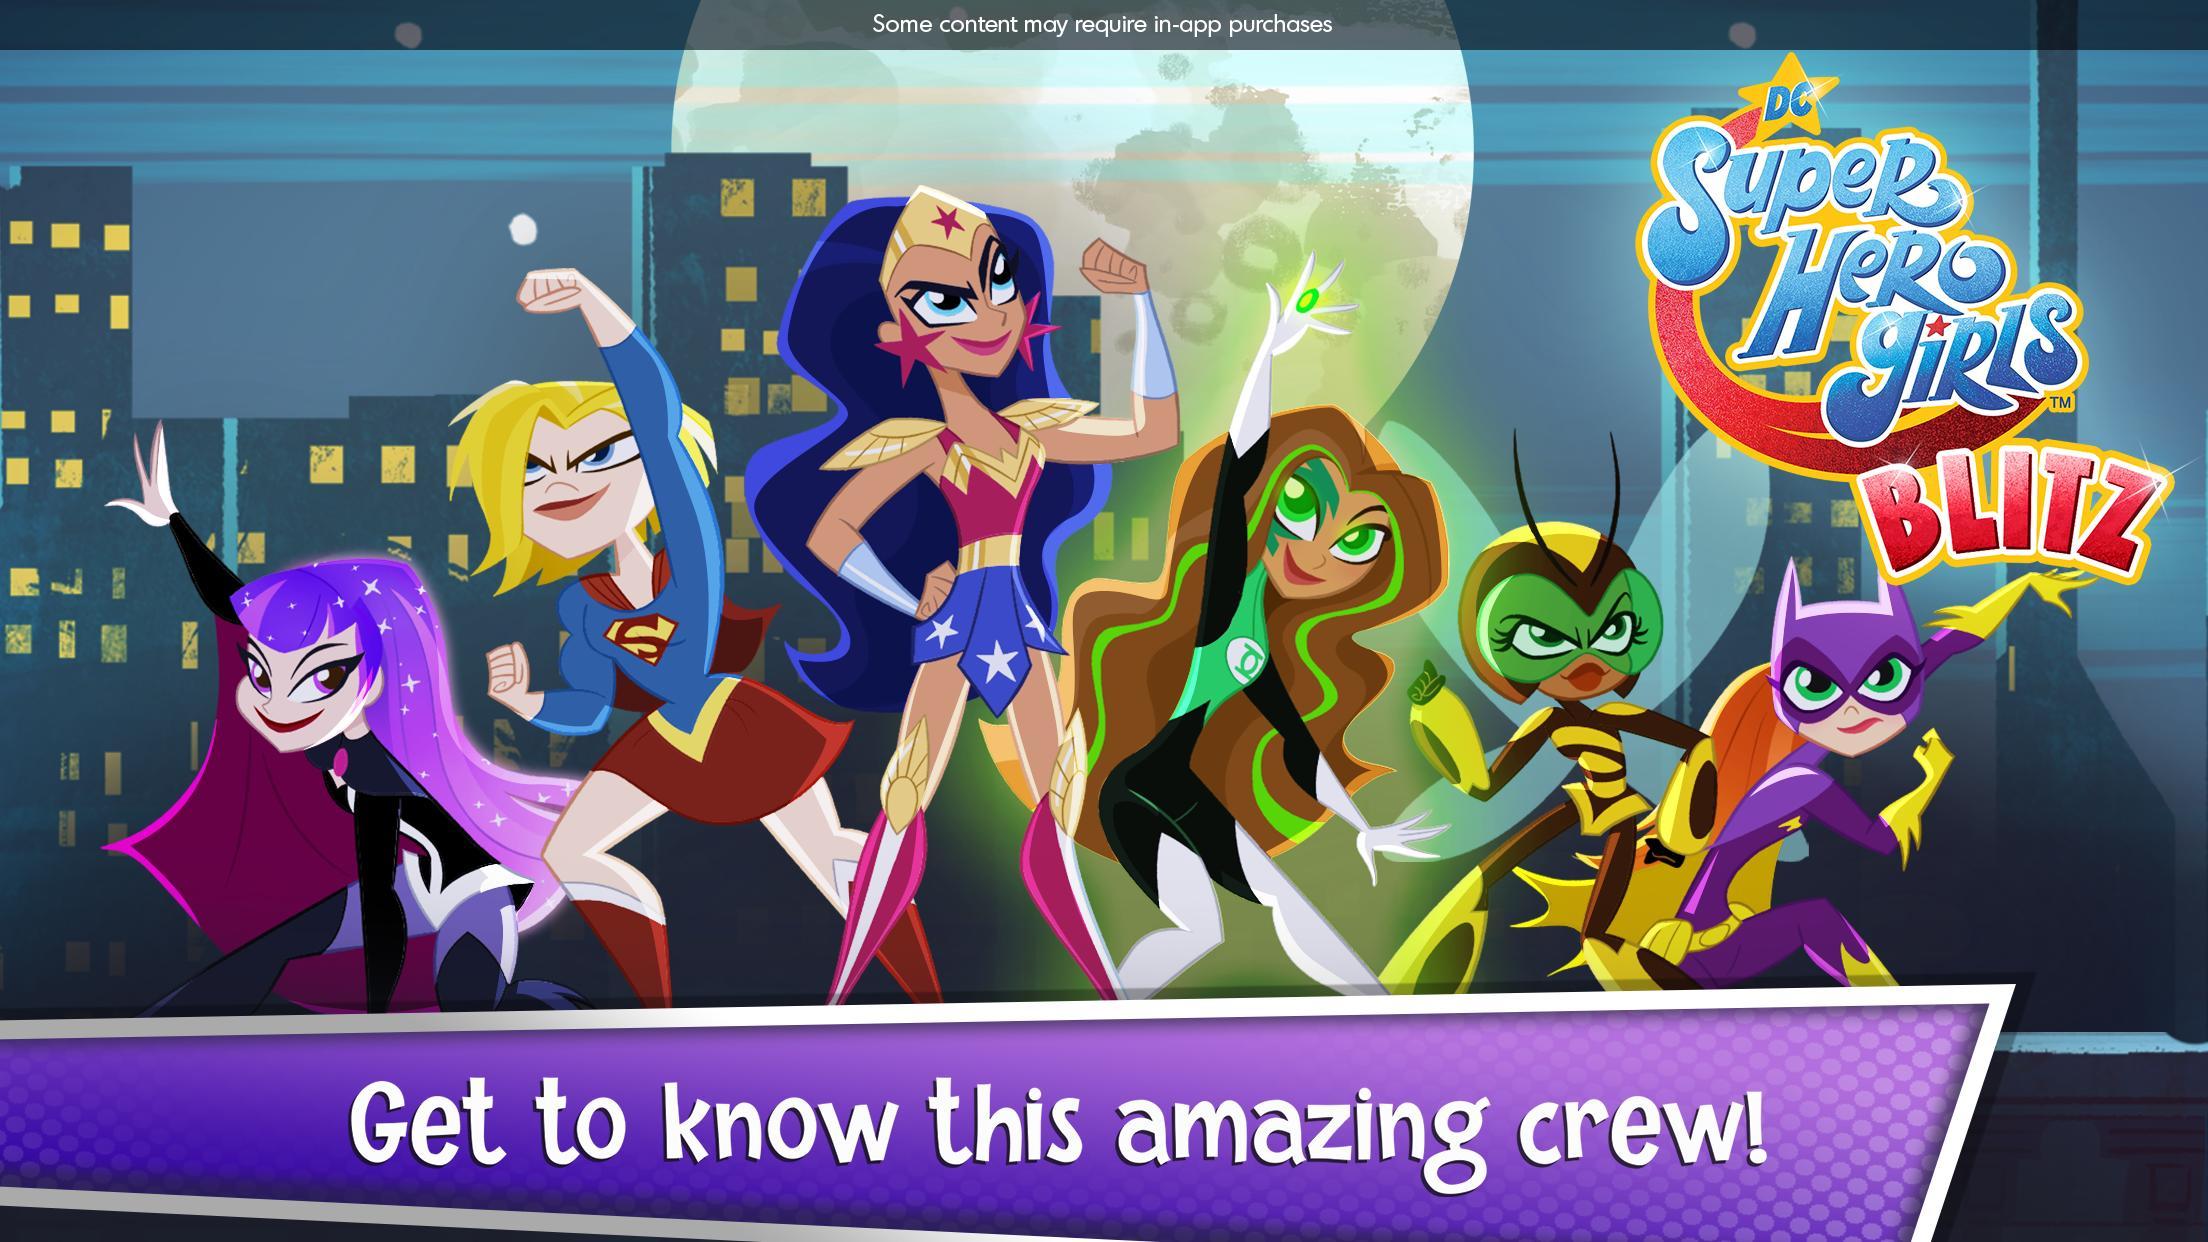 DC Super Hero Girls Blitz 1.4 Screenshot 7